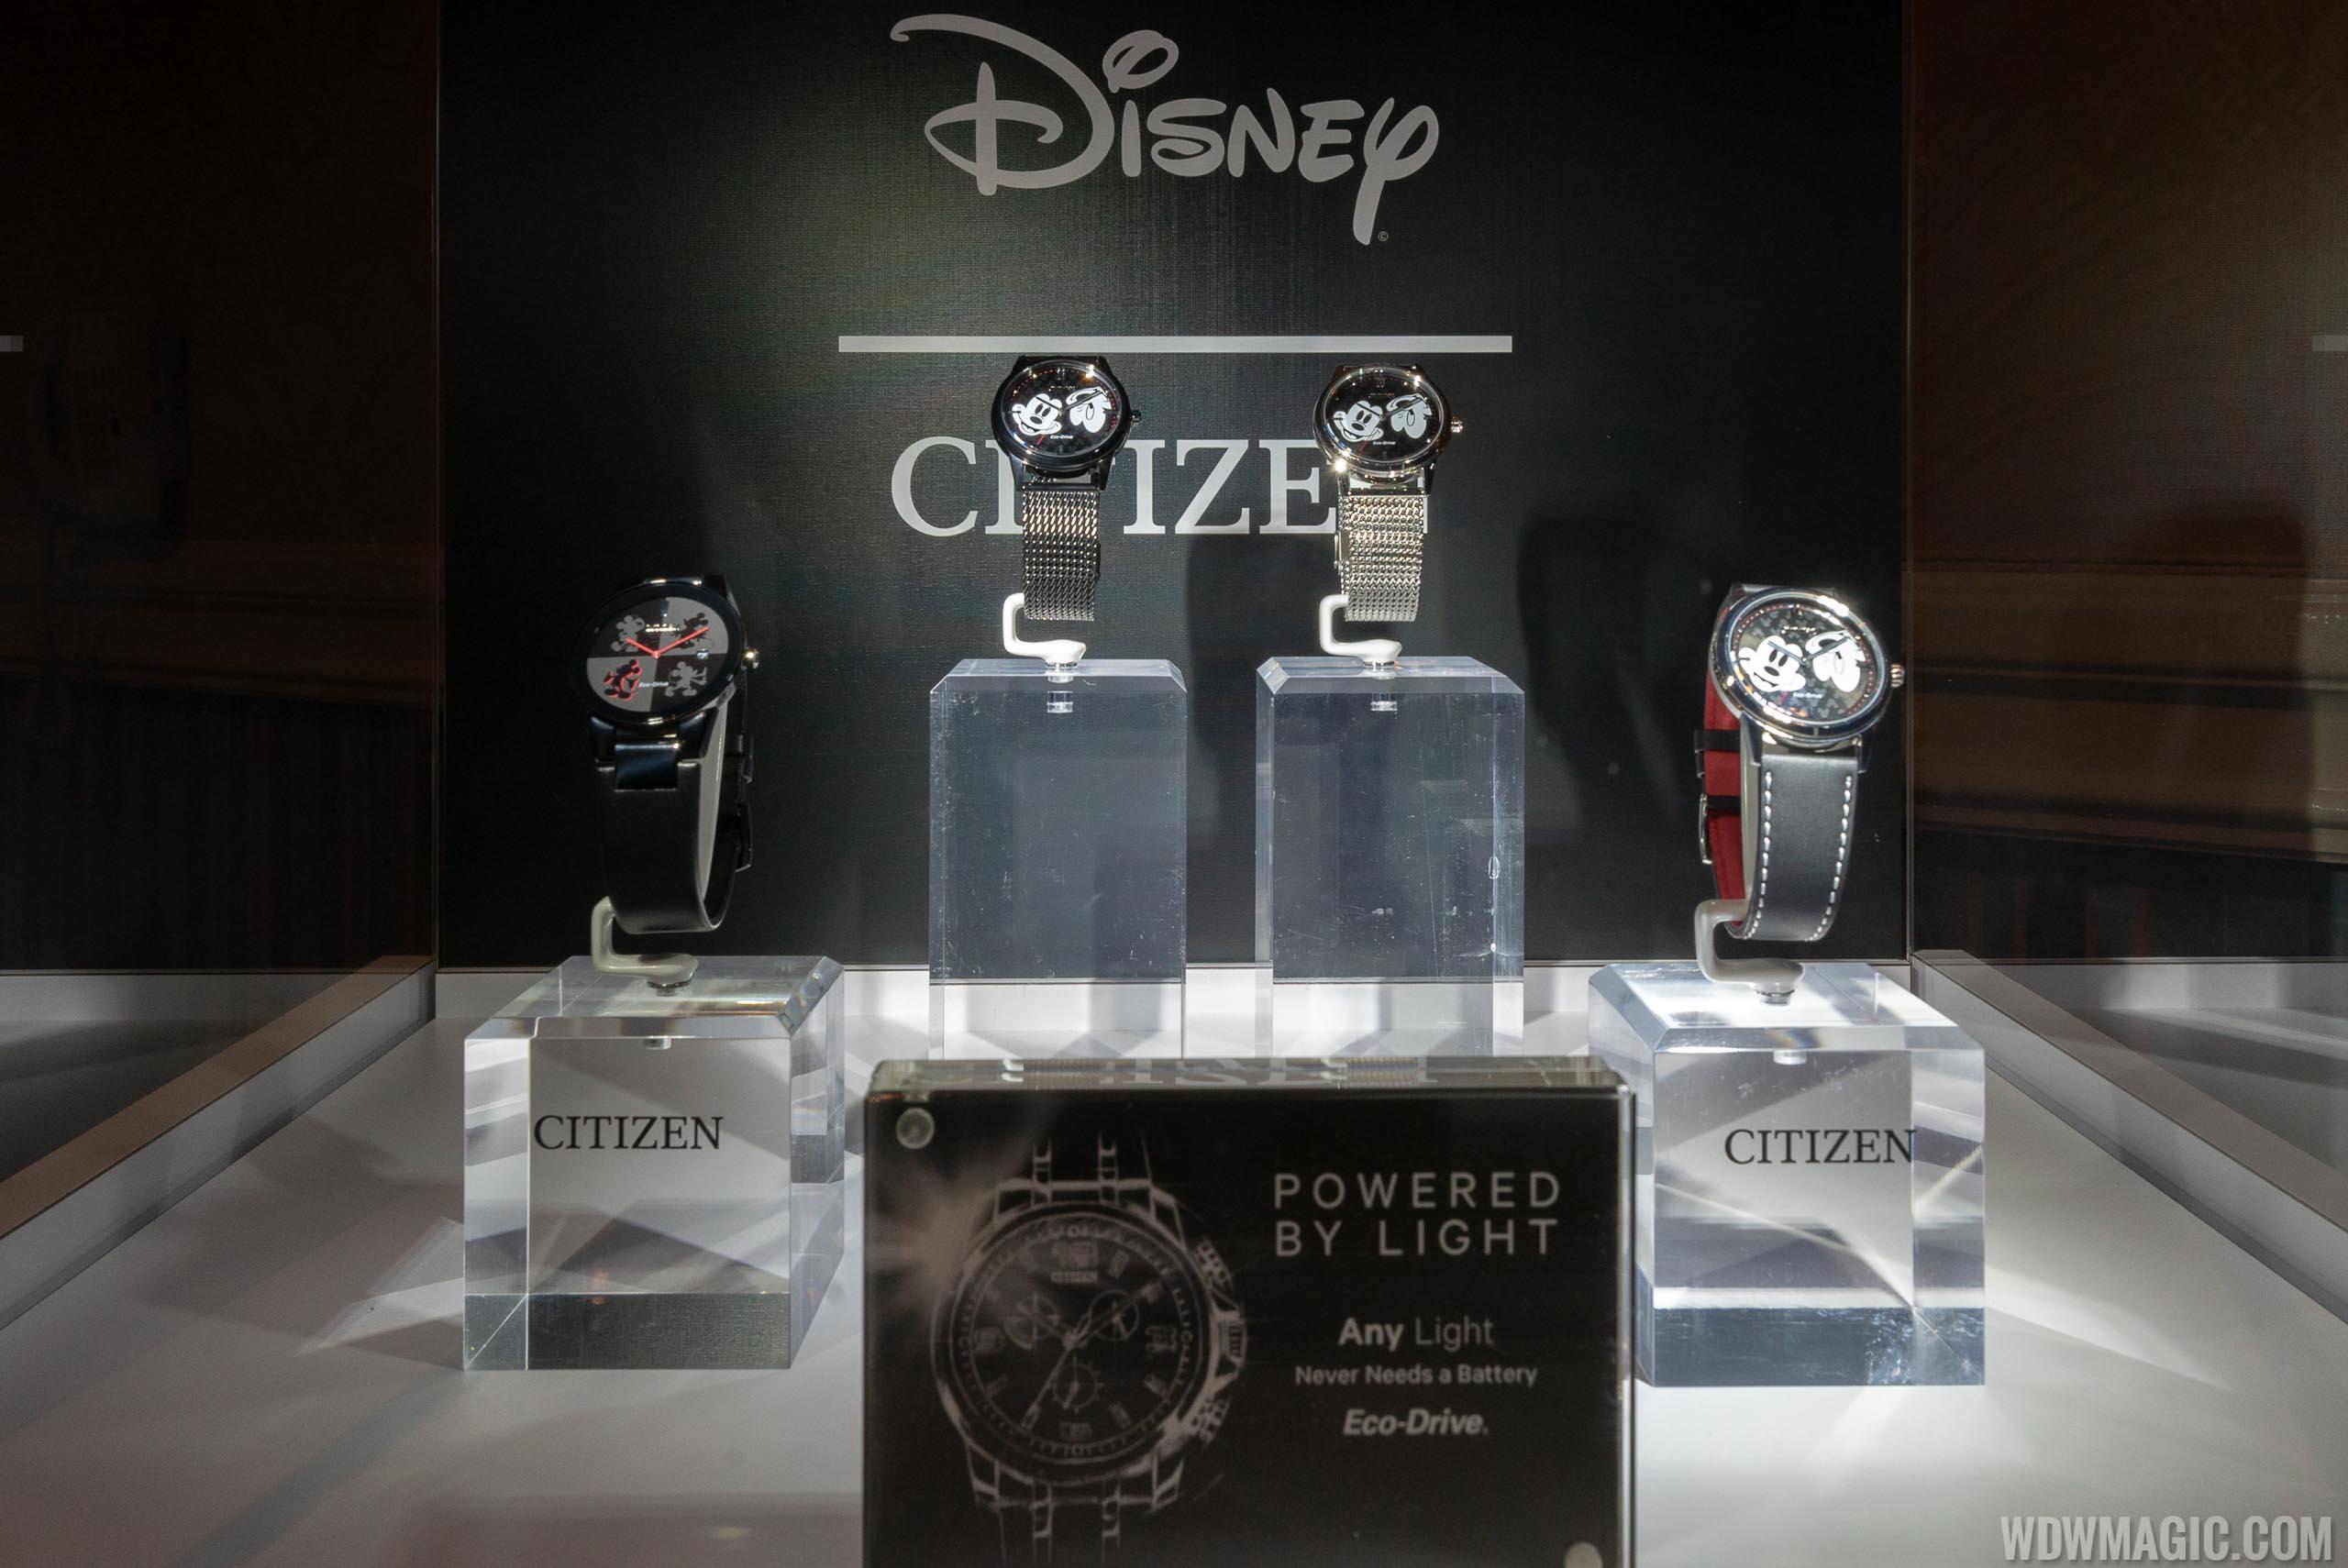 Citizen and Disney alliance